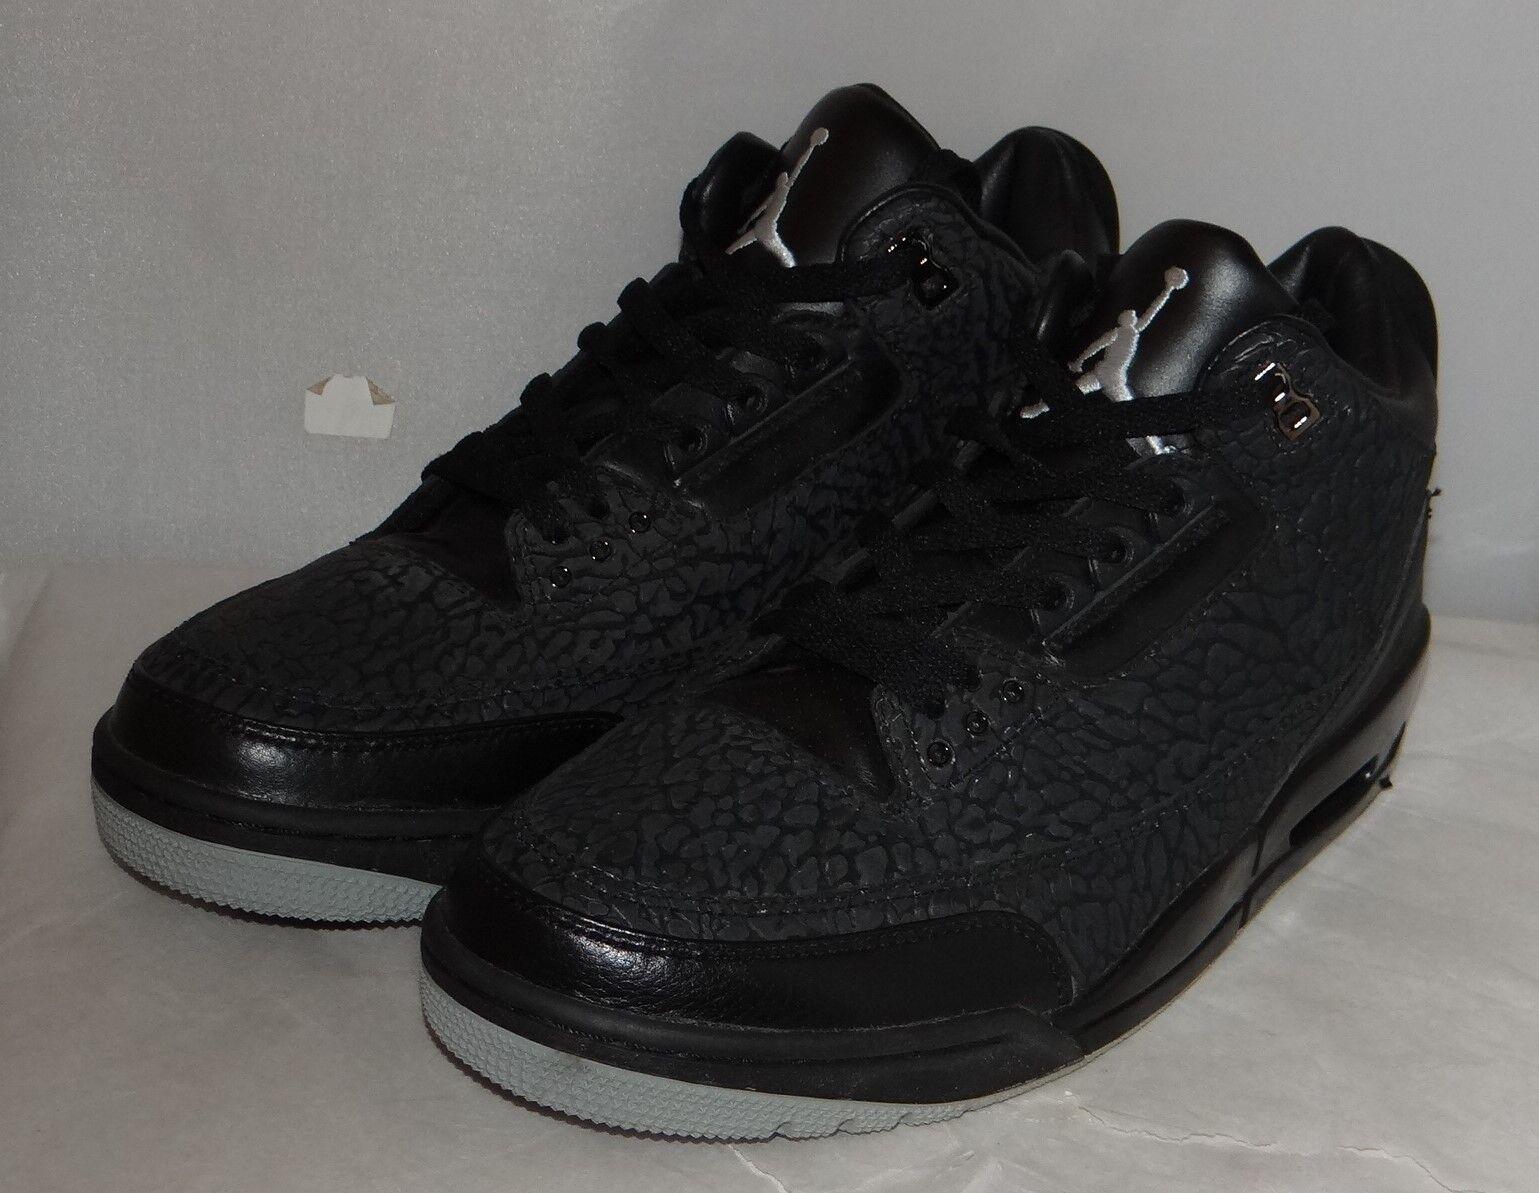 New Air Jordan 3 Black Black Black Flip Size 11.5 73278d